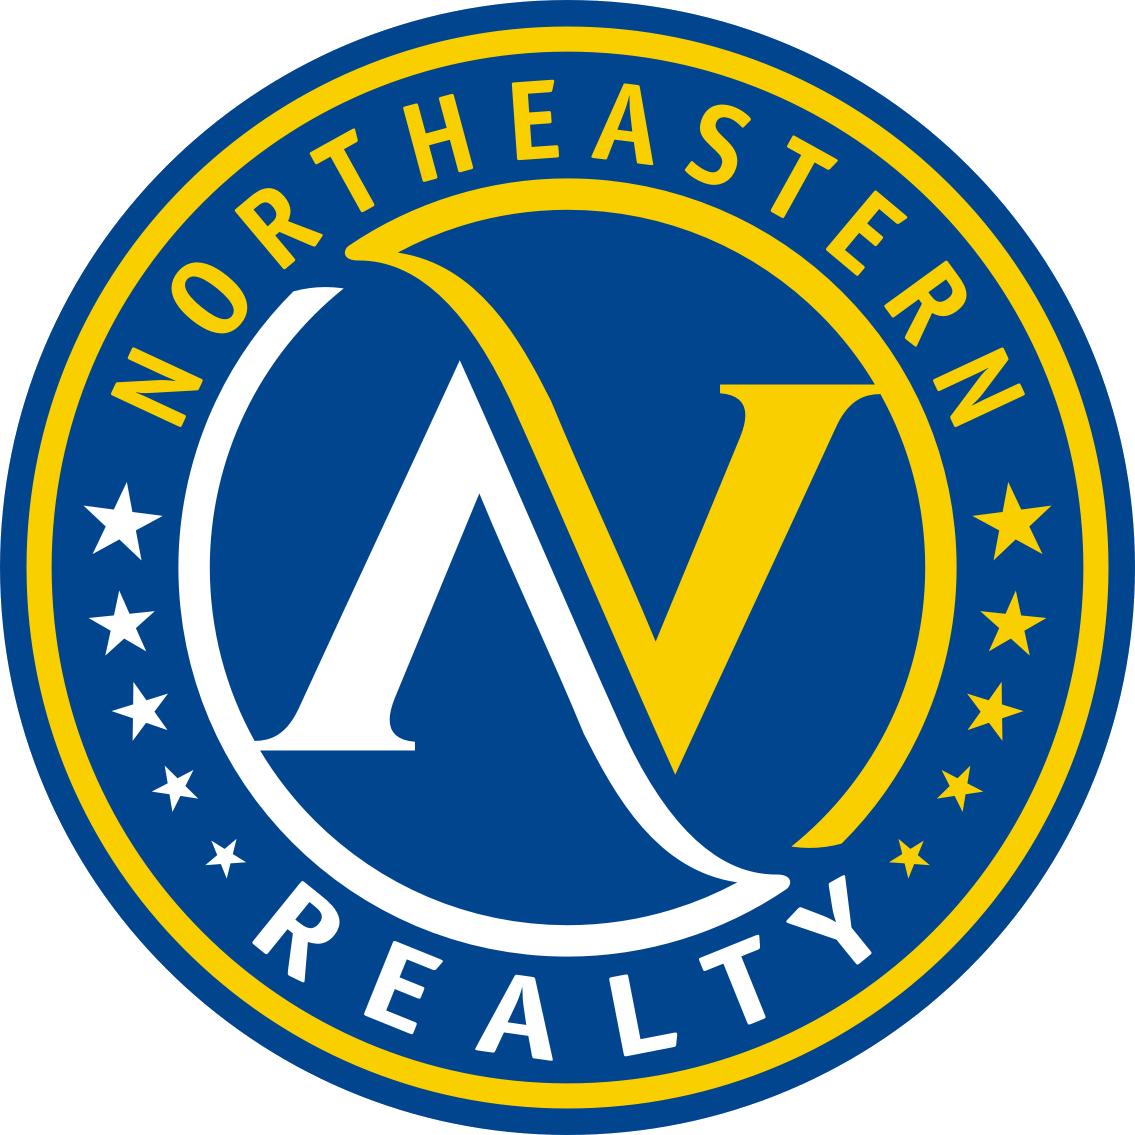 NORTHEASTERN REALTY LLC